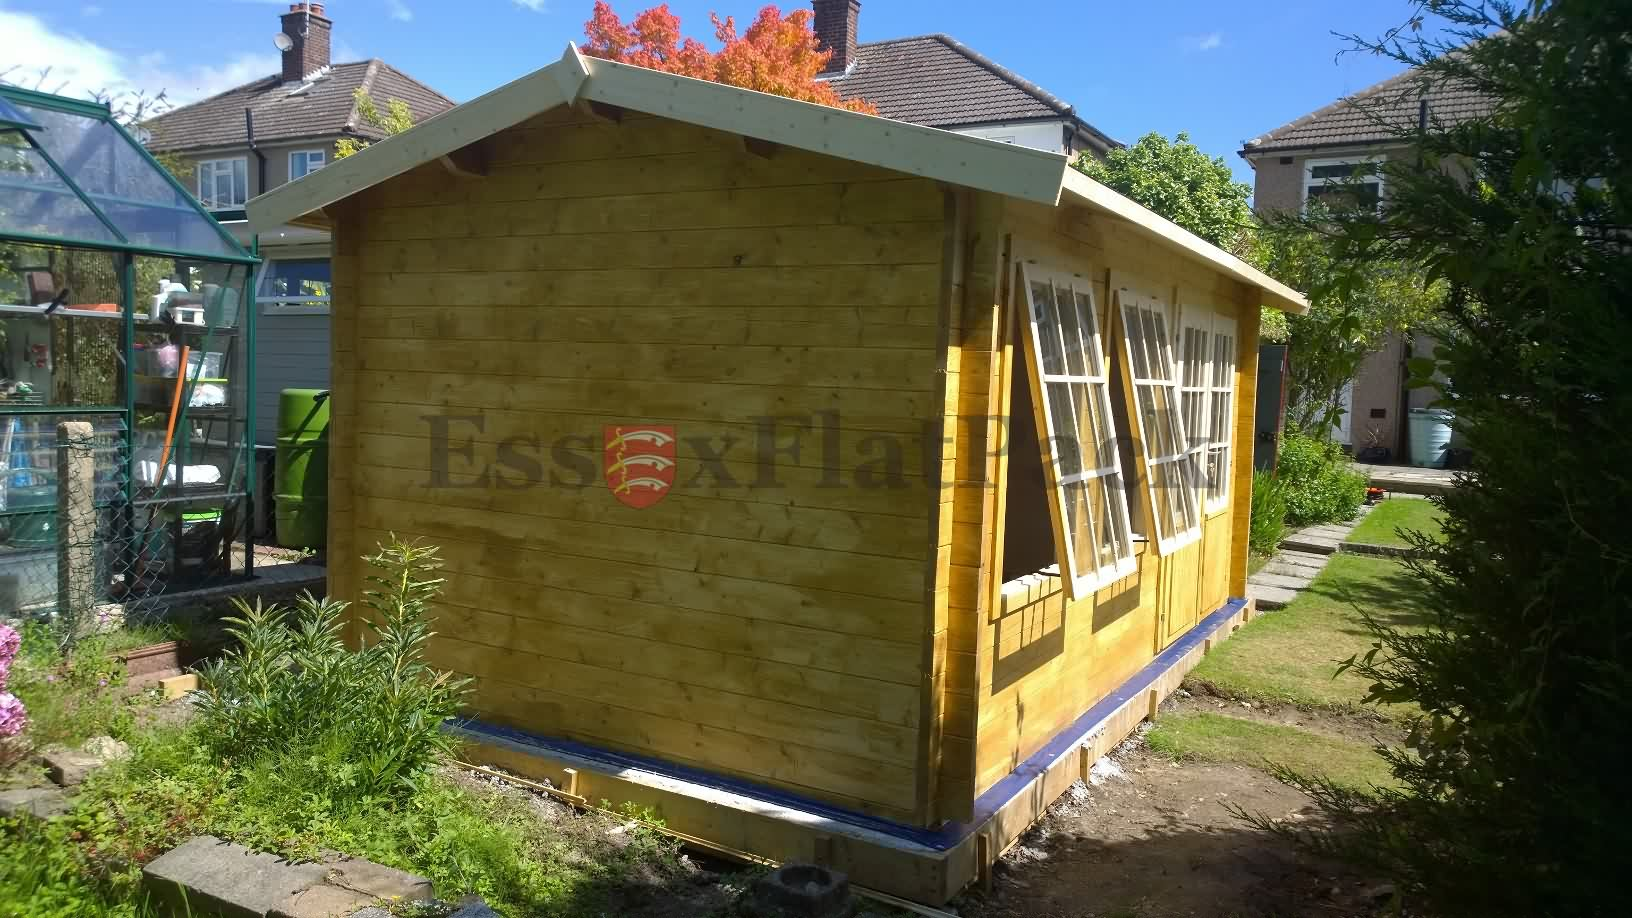 essexflatpack-log-cabins-20170801114315.jpg